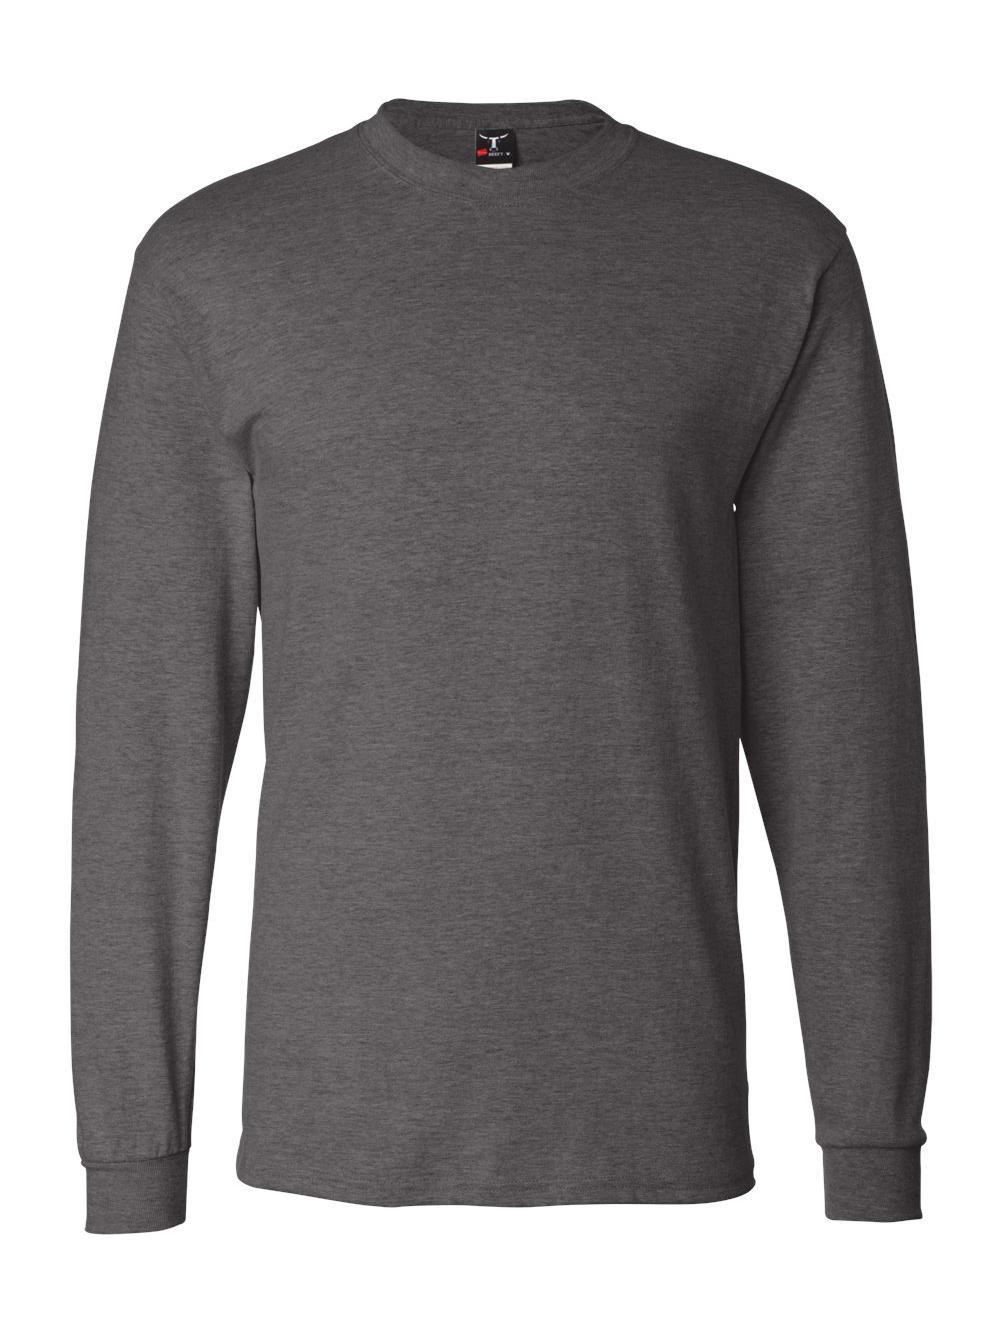 Hanes-Beefy-T-Long-Sleeve-T-Shirt-5186 thumbnail 15